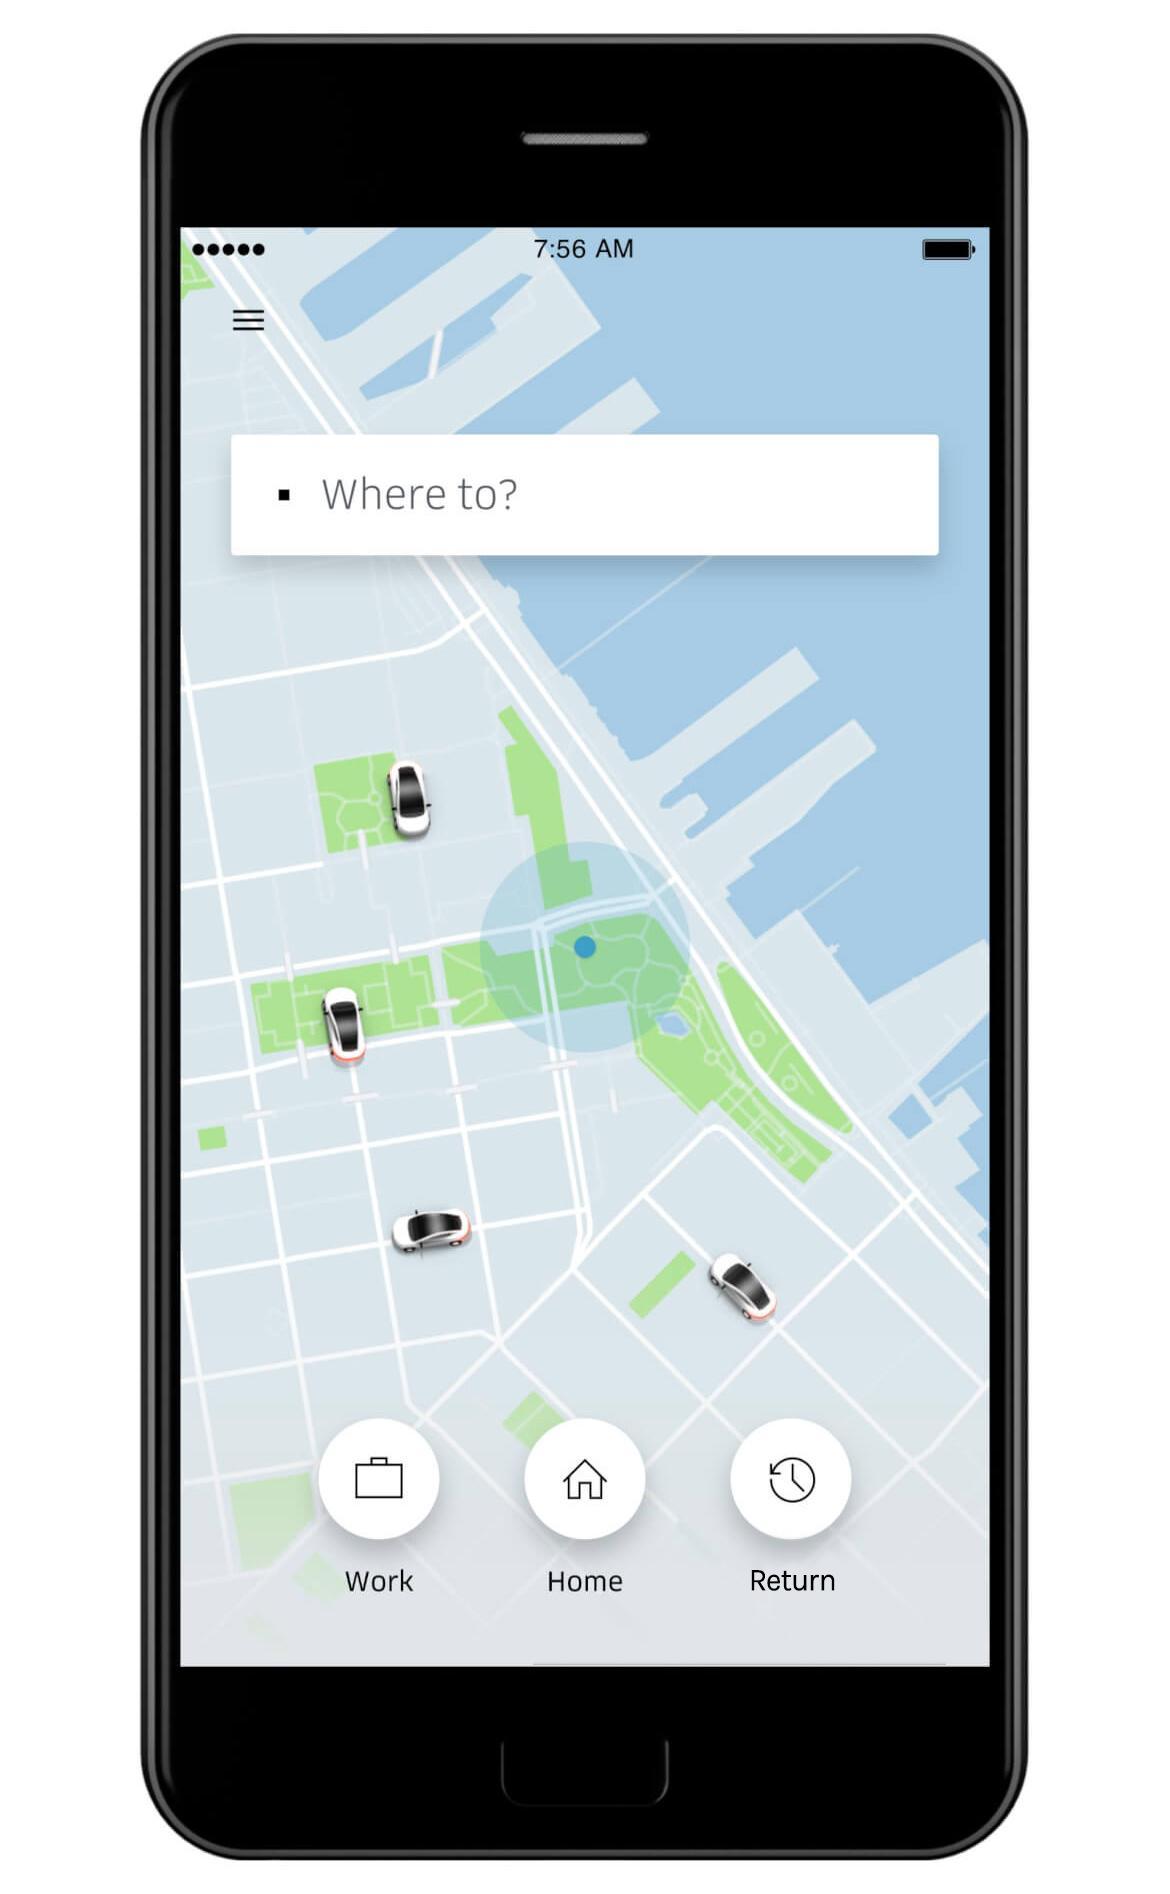 Uber mobile app anticipatory design